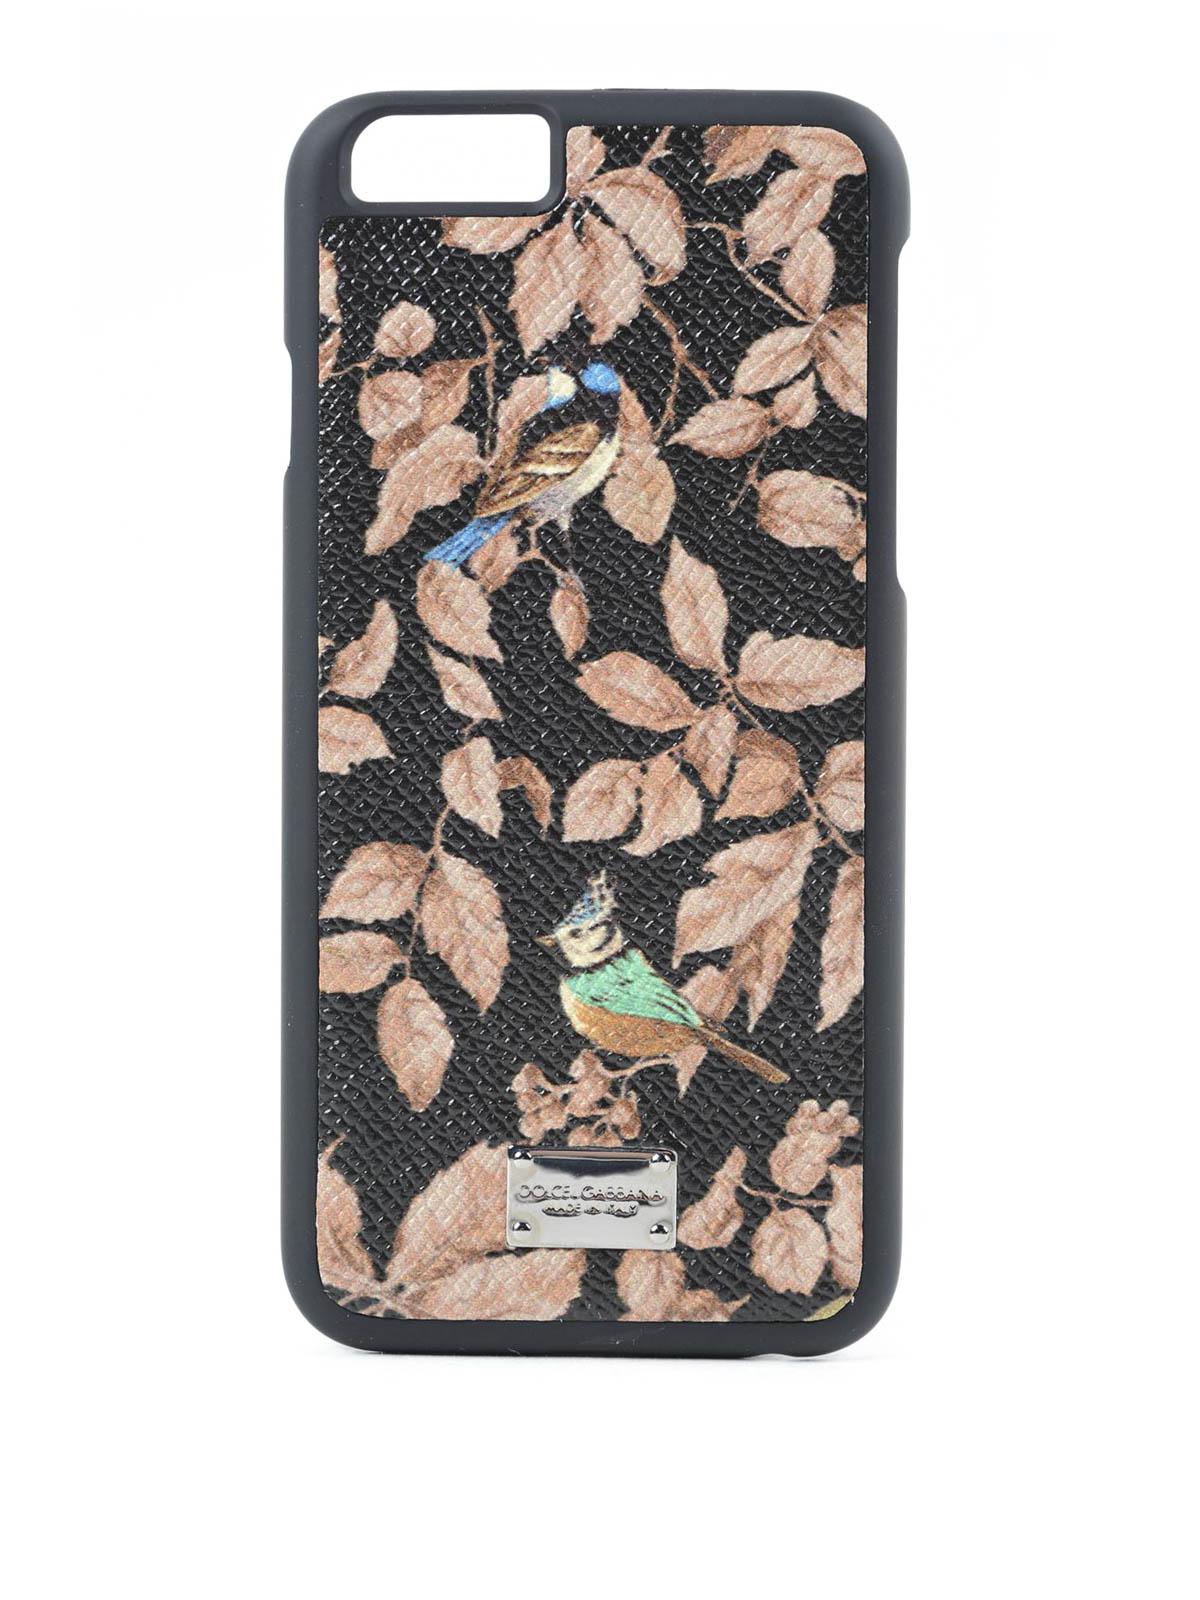 cover iphone 6 dolce e gabbana